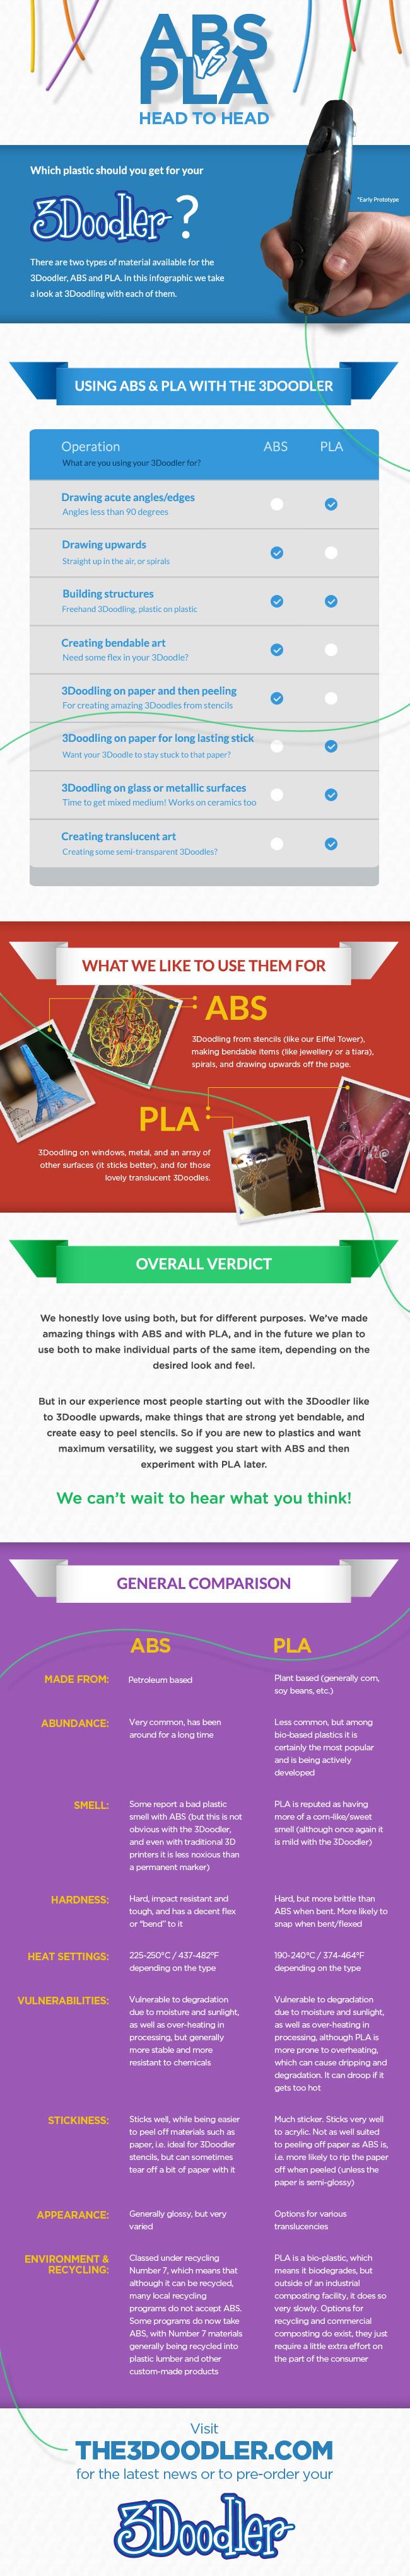 3doodler_infographic_high